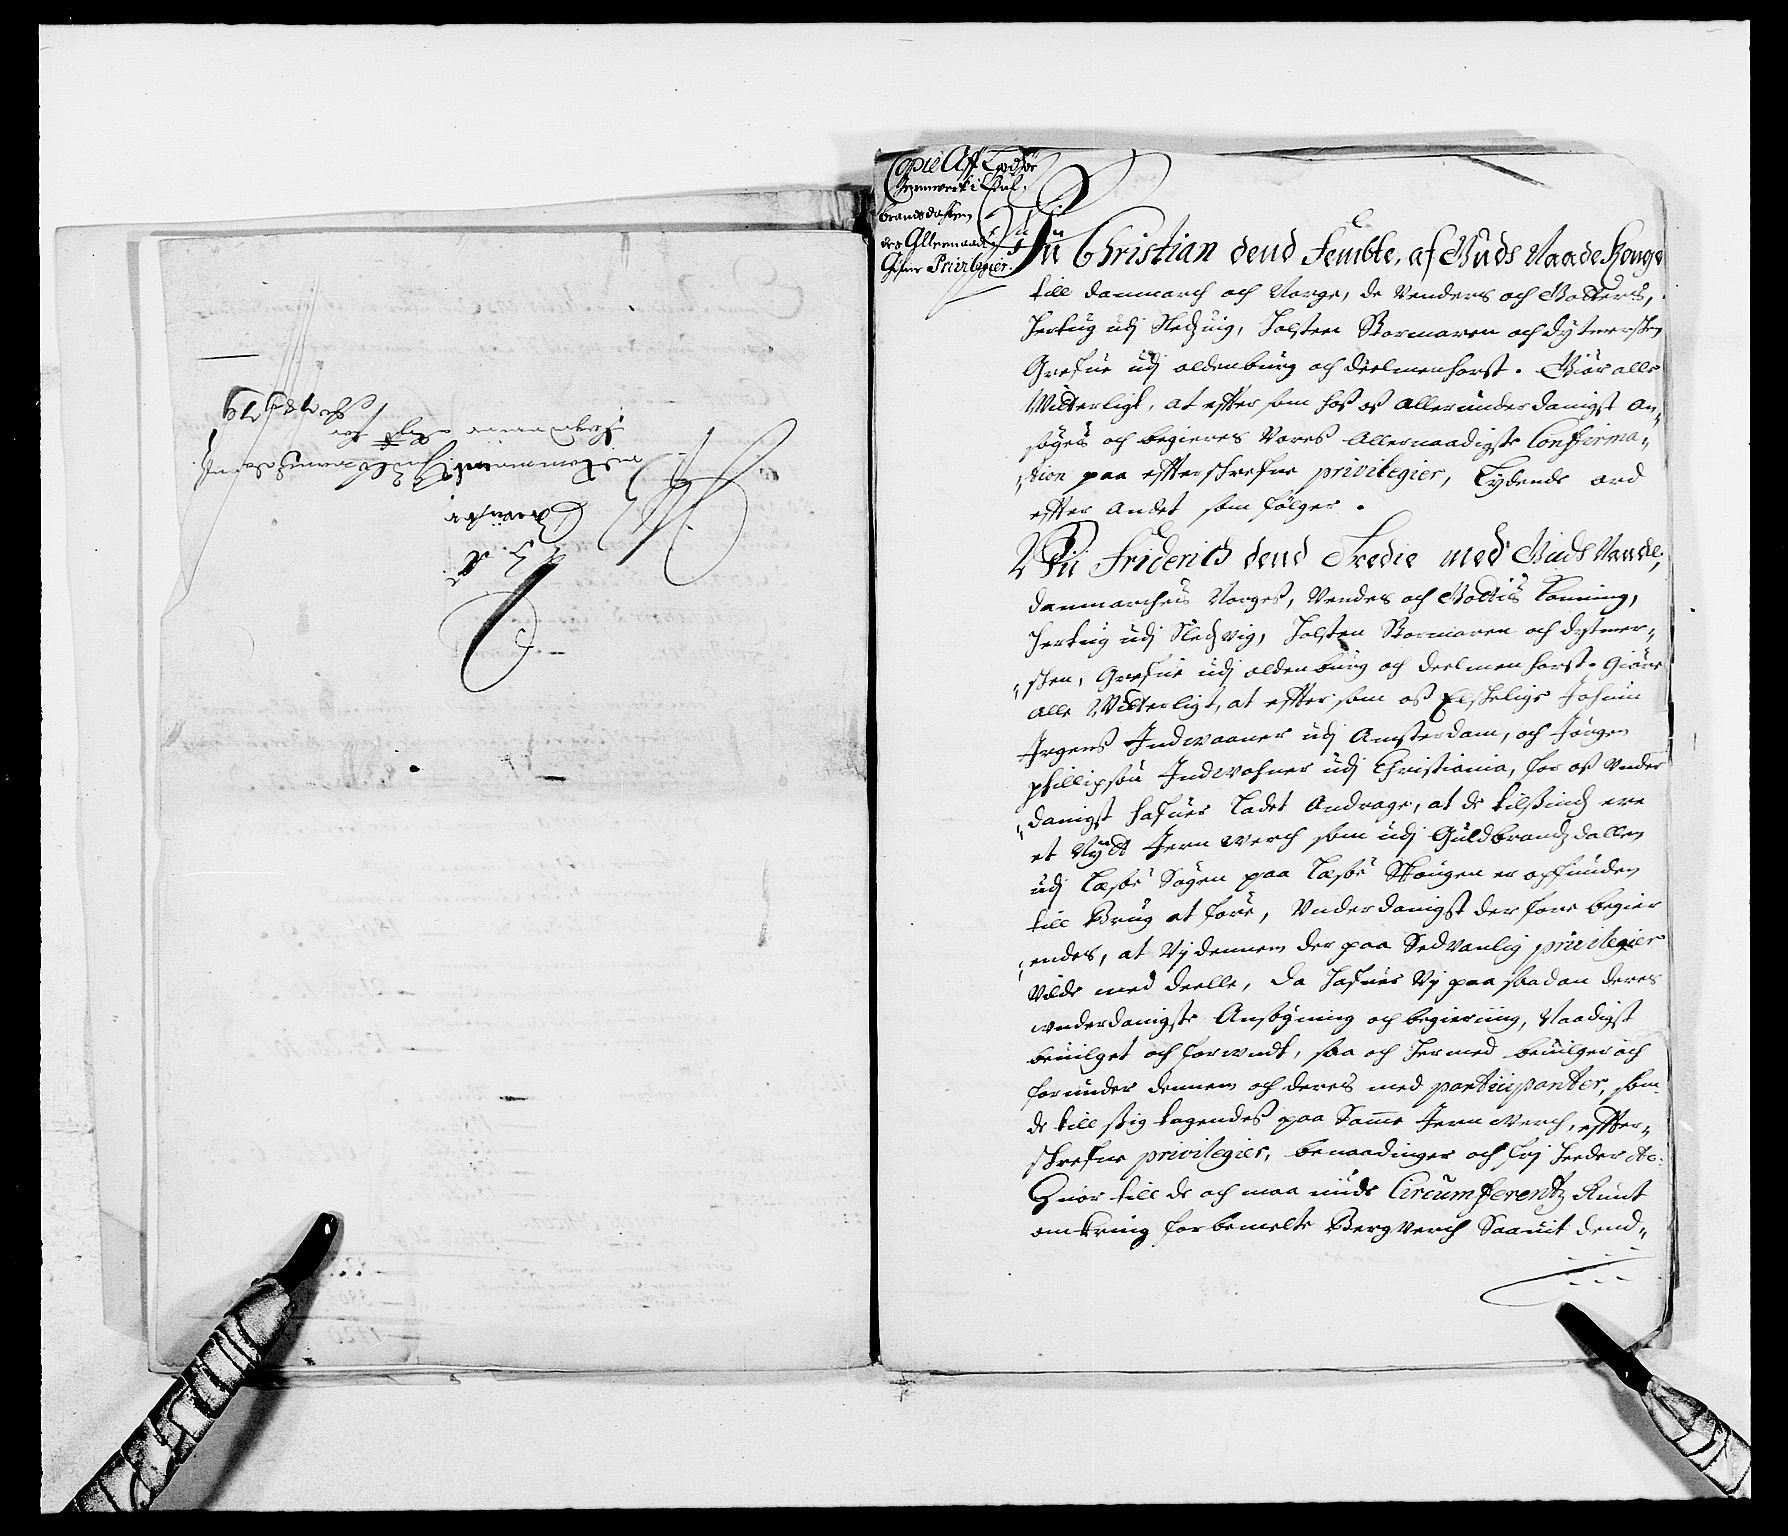 RA, Rentekammeret inntil 1814, Reviderte regnskaper, Fogderegnskap, R17/L1153: Fogderegnskap Gudbrandsdal, 1678-1679, s. 455